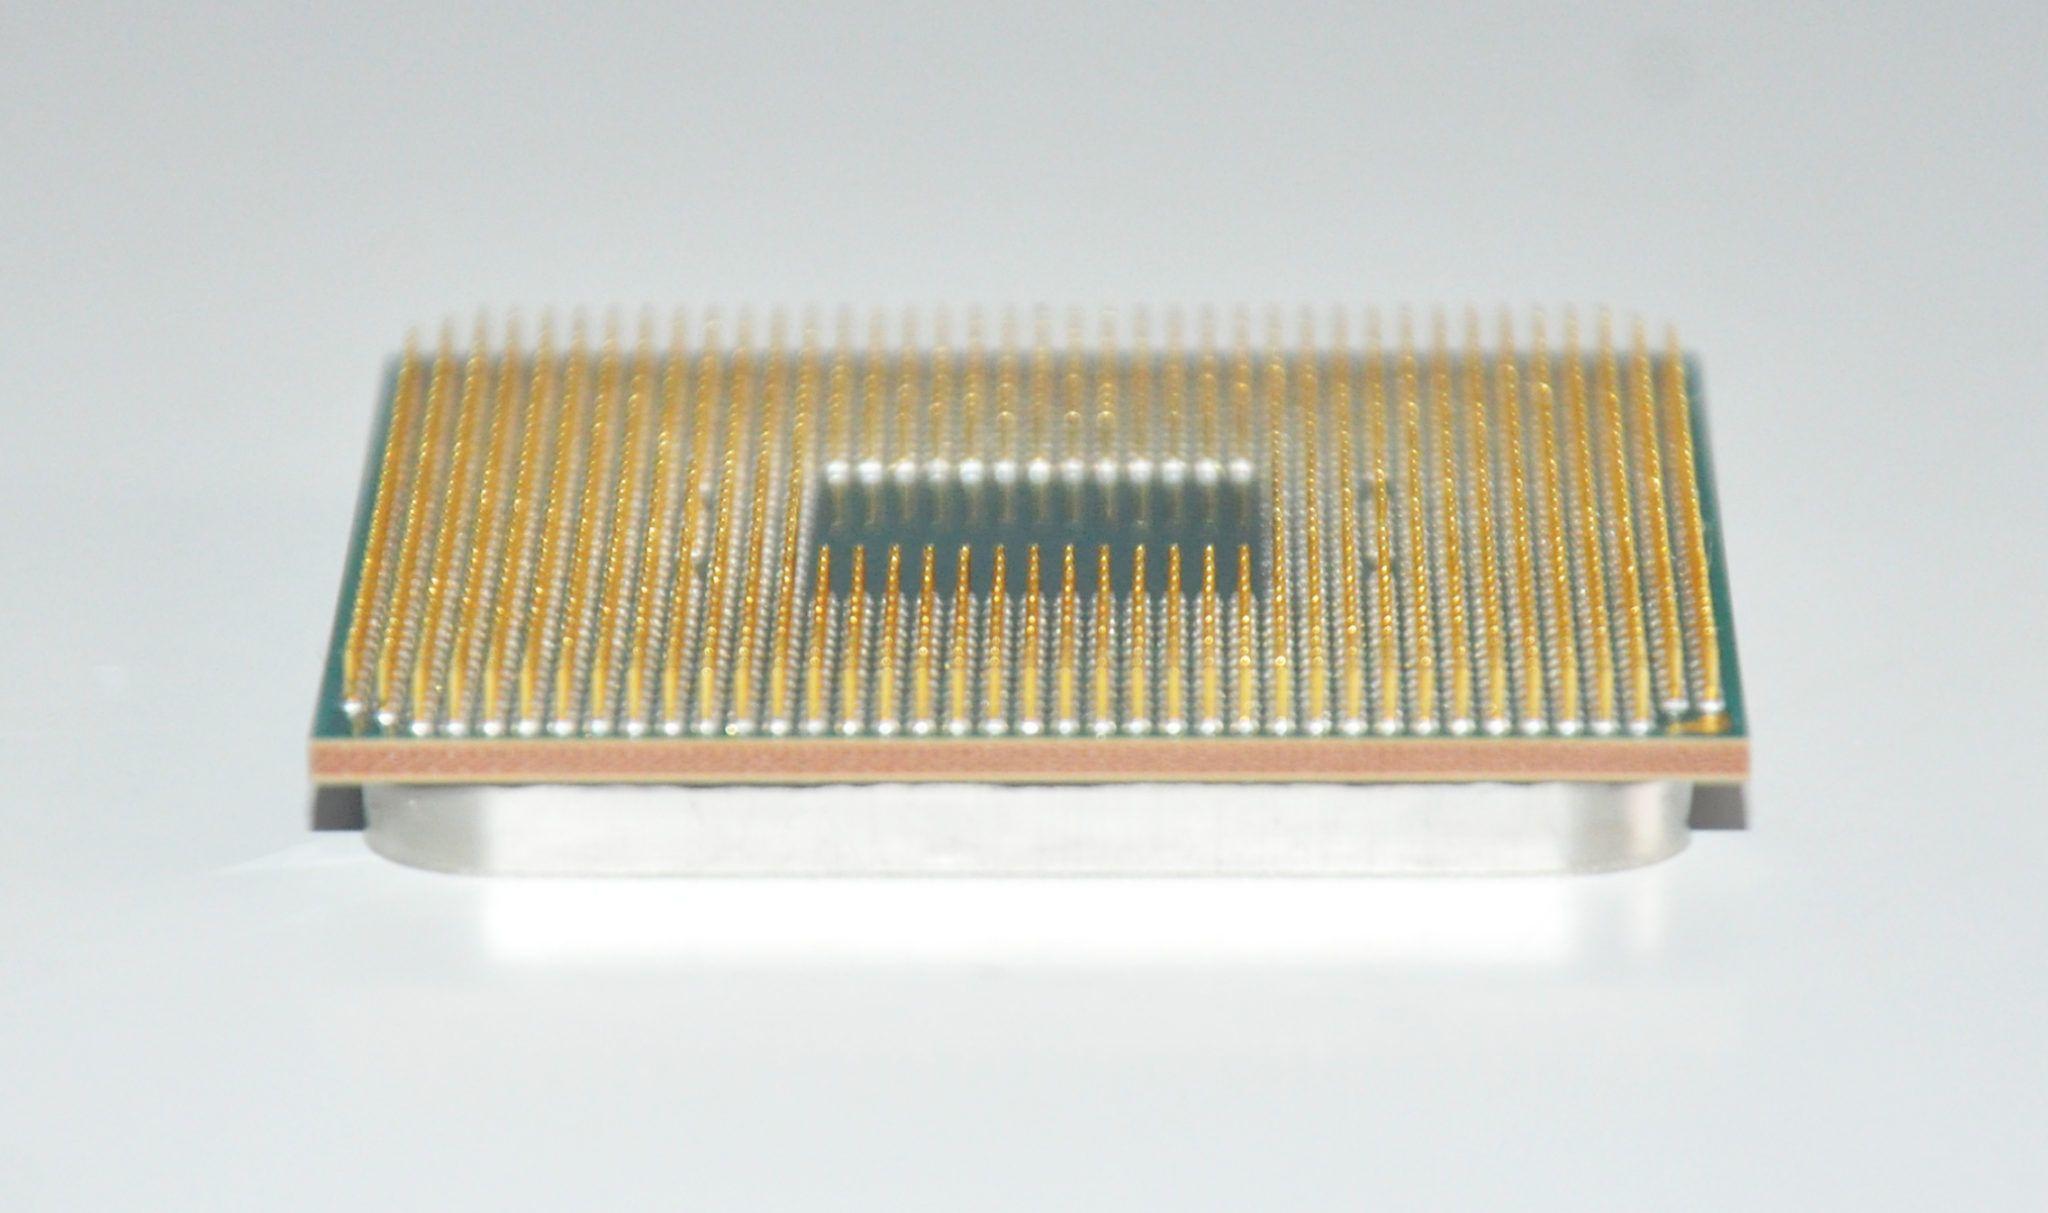 Review Ryzen 5 5600X 14